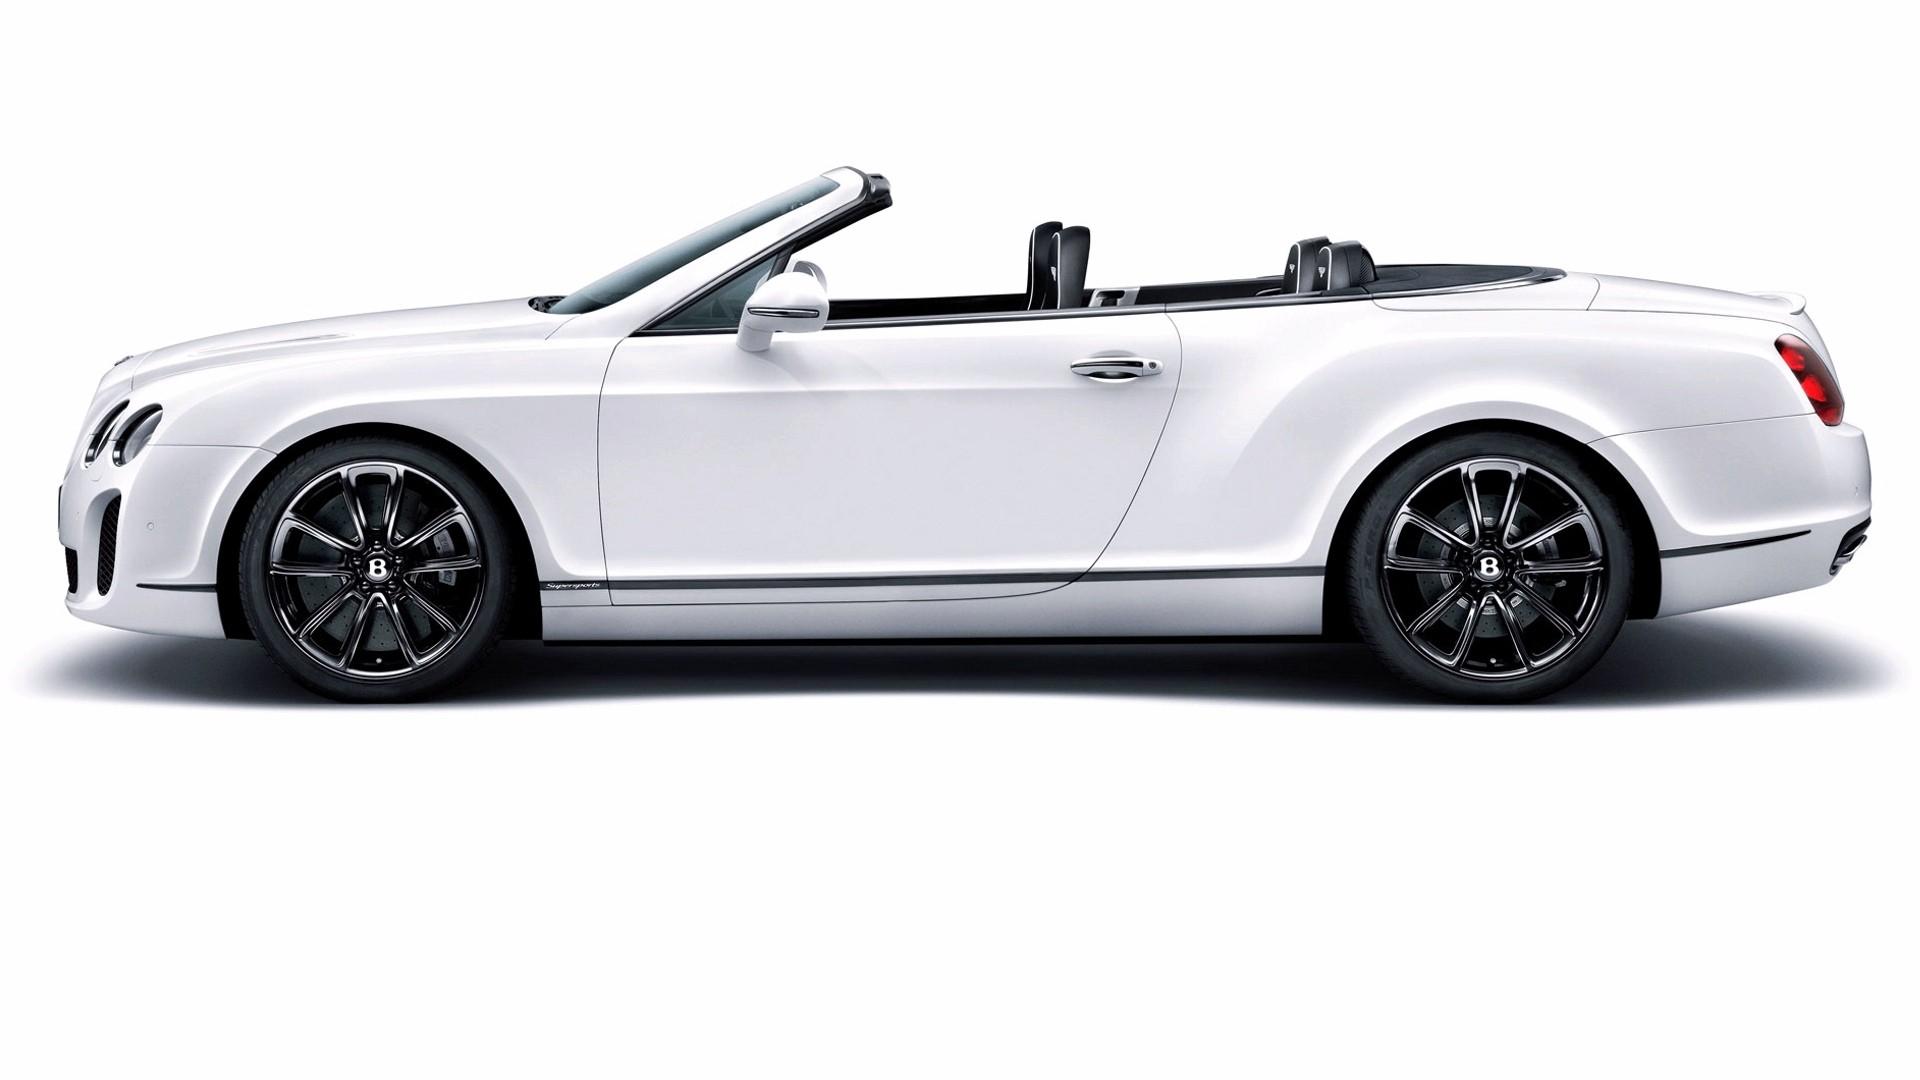 Cars Bentley Convertible White Cars Wallpaper 1920x1080